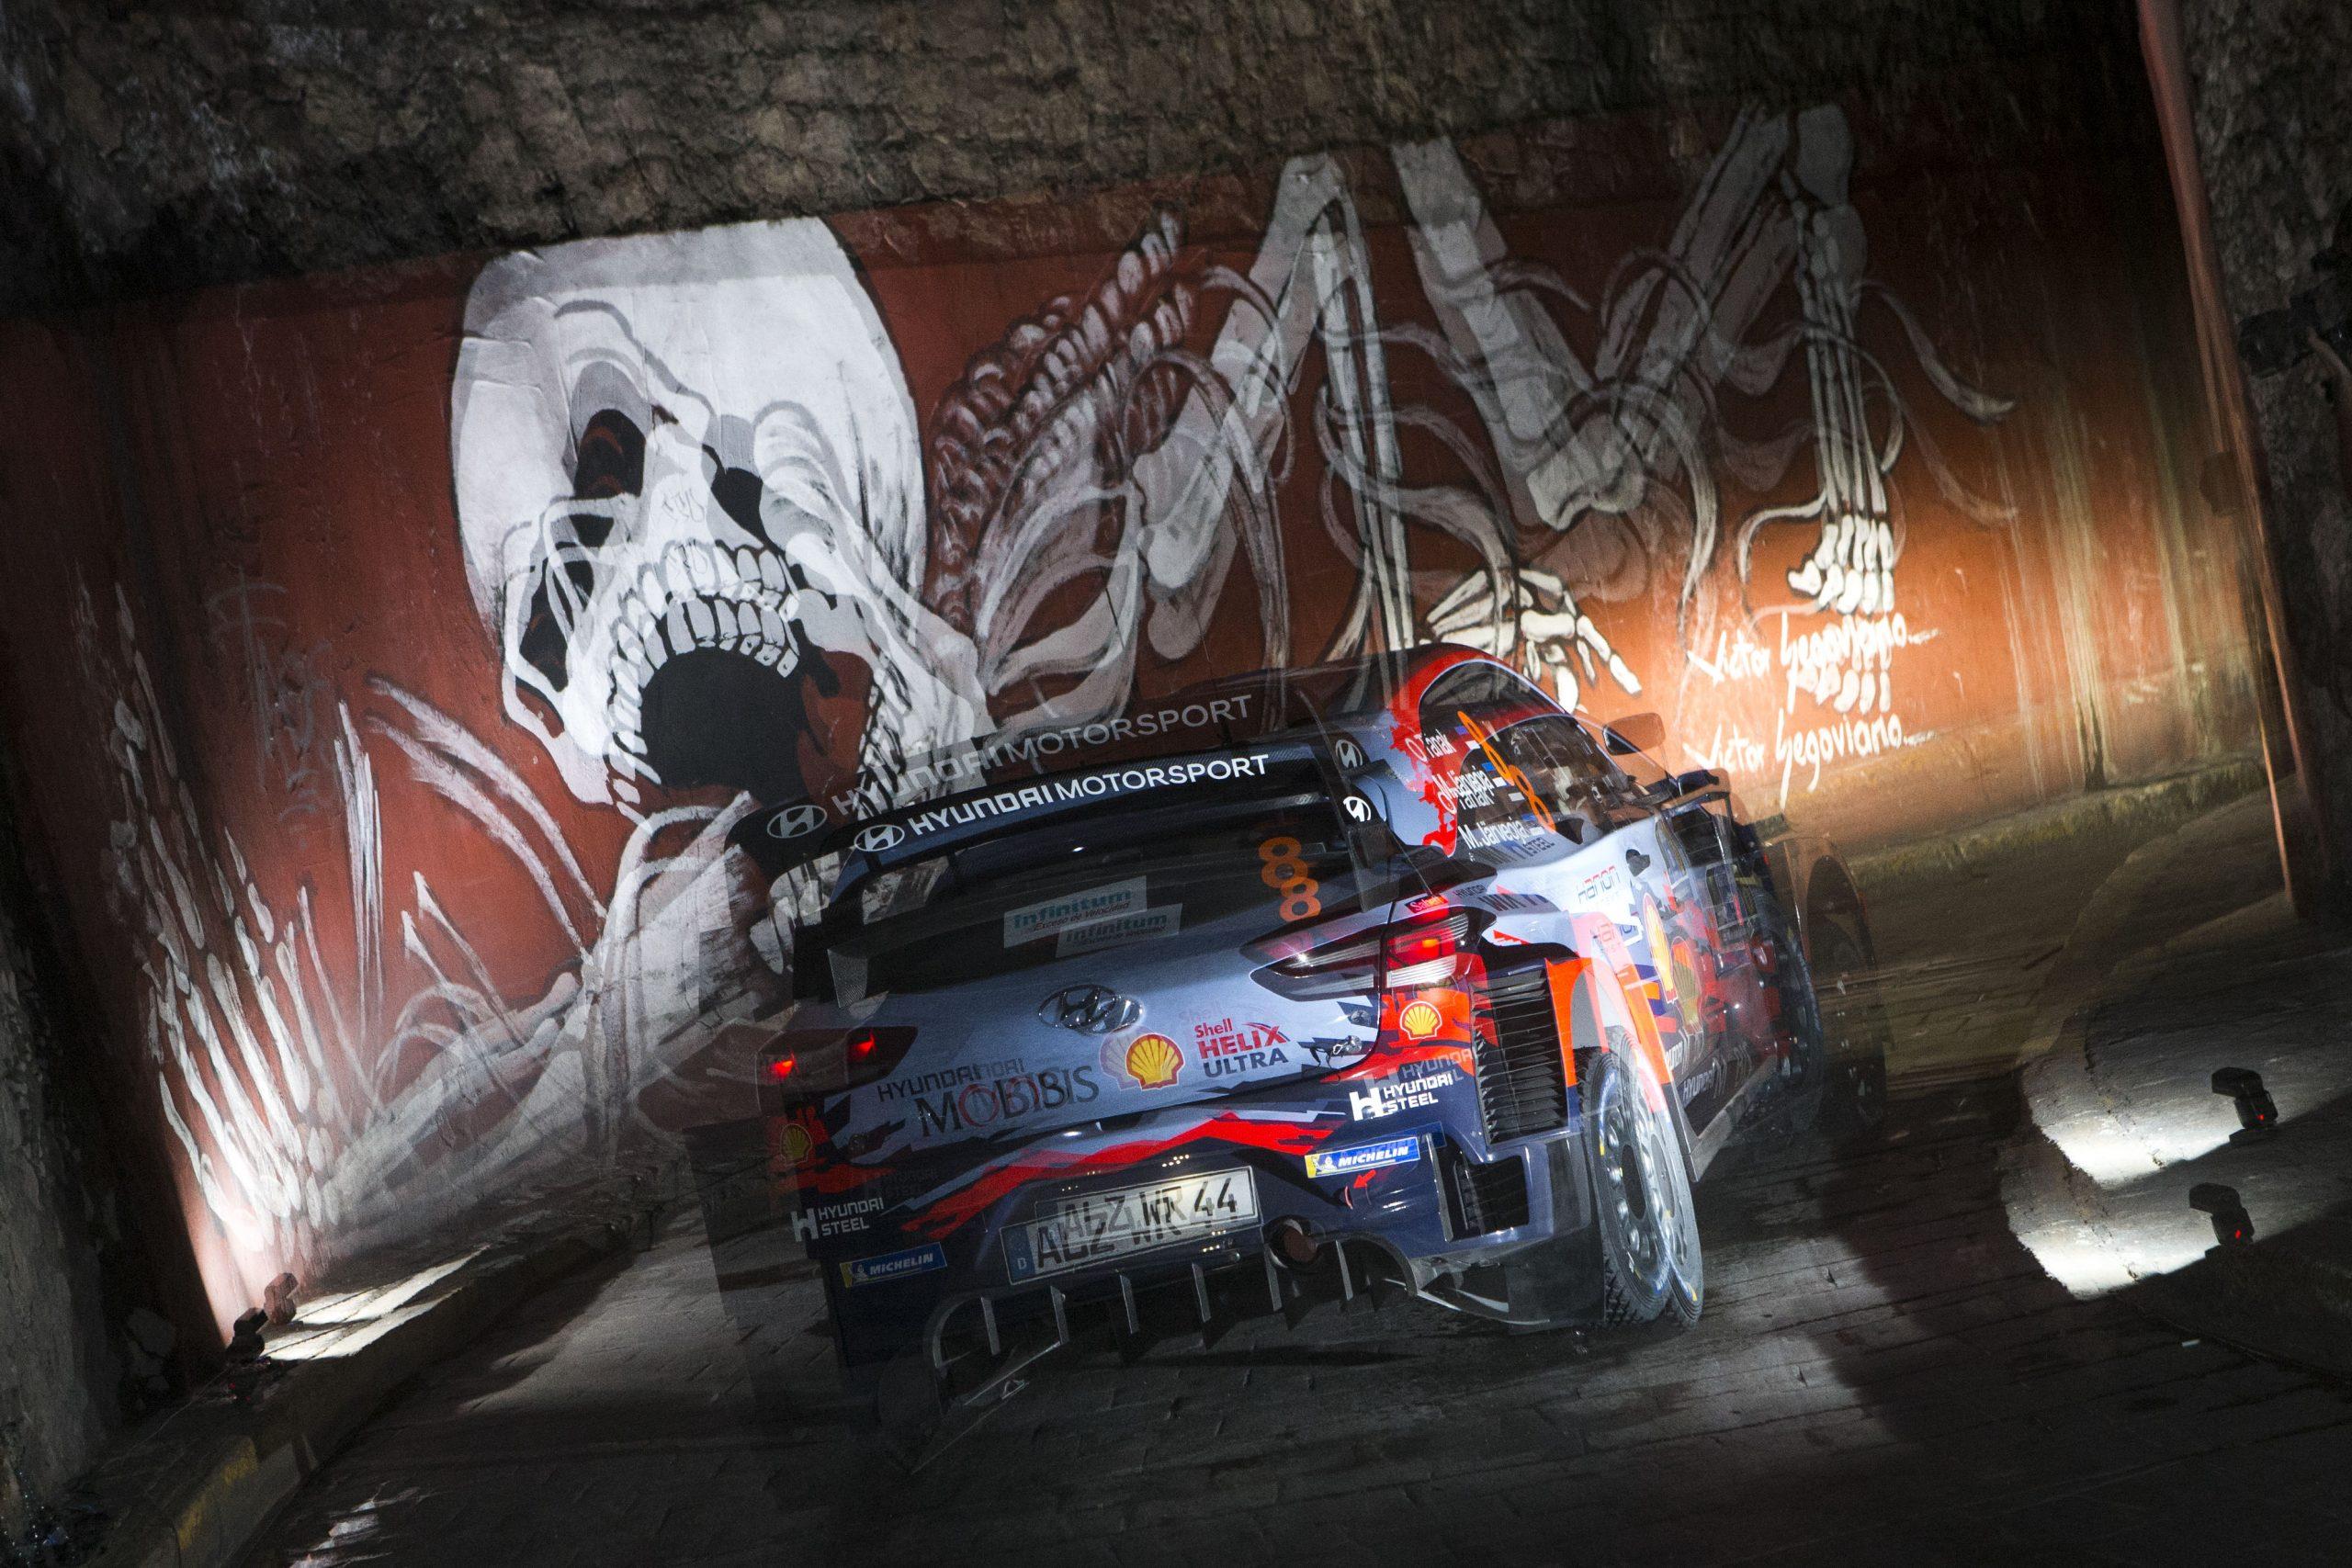 FIA World Rally Championship in Rally Mexico 2019